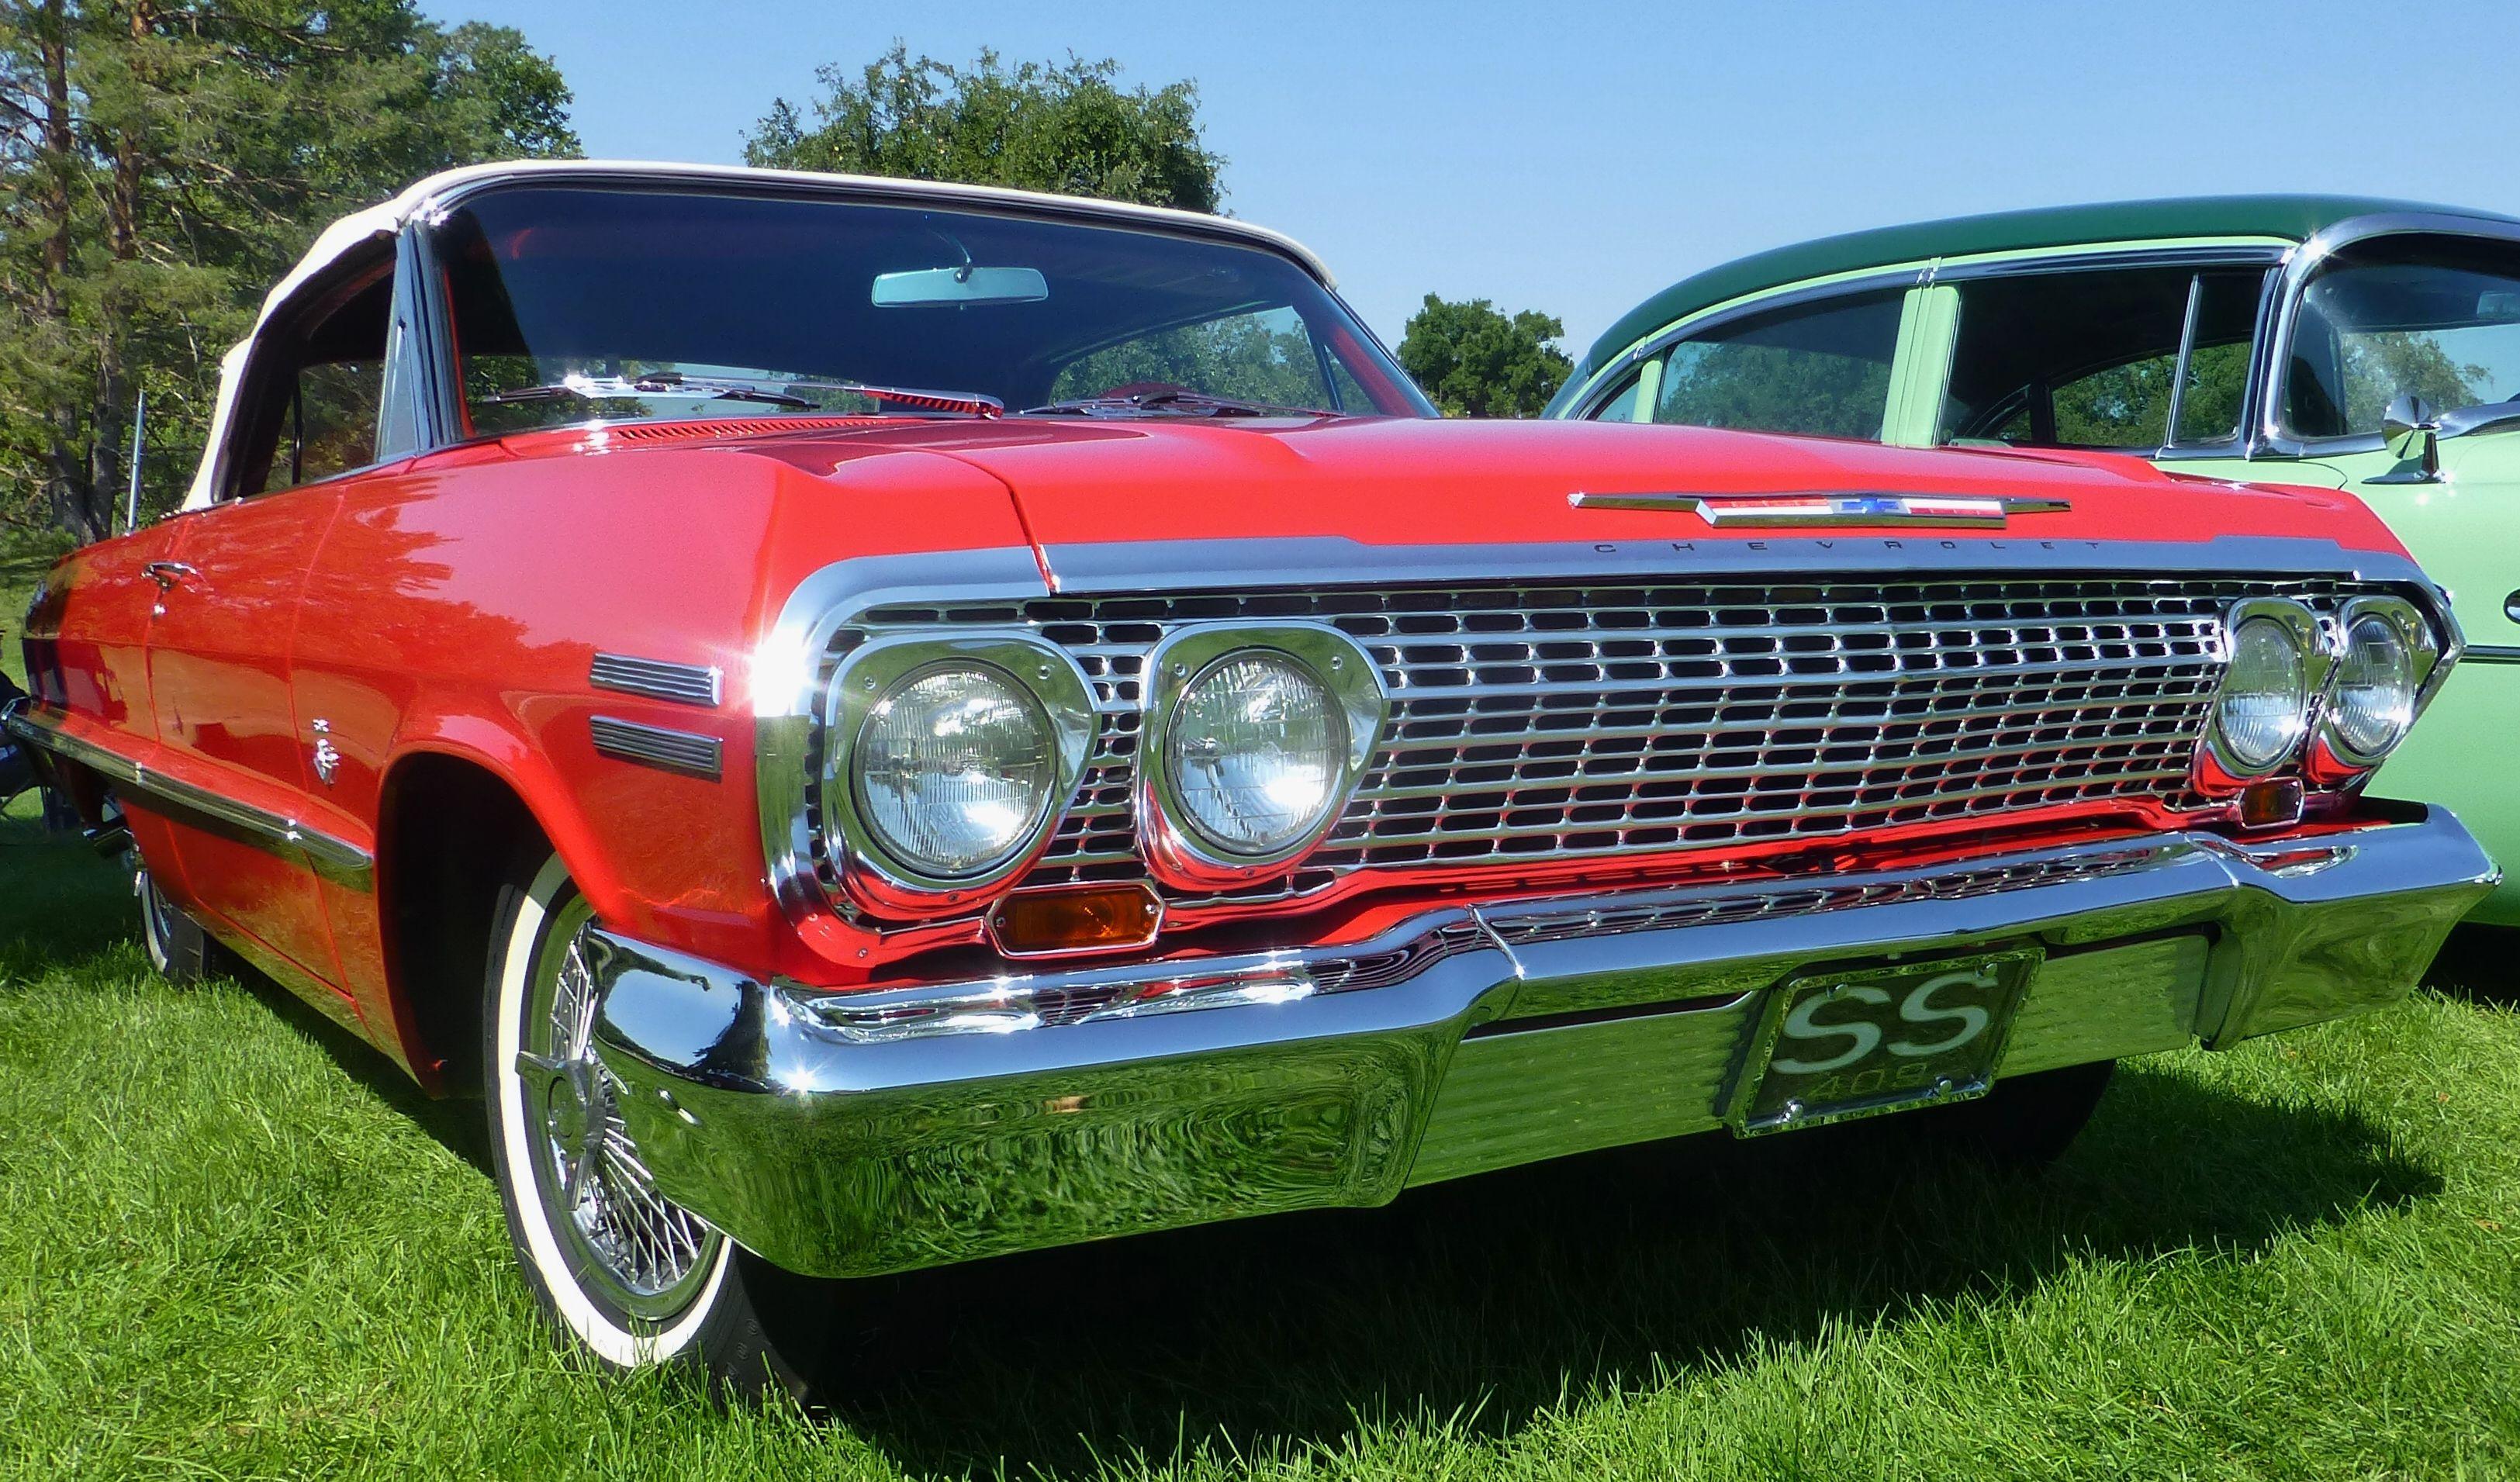 1963 Chevrolet Impala SS 409. Photography by David E. Nelson, 2017